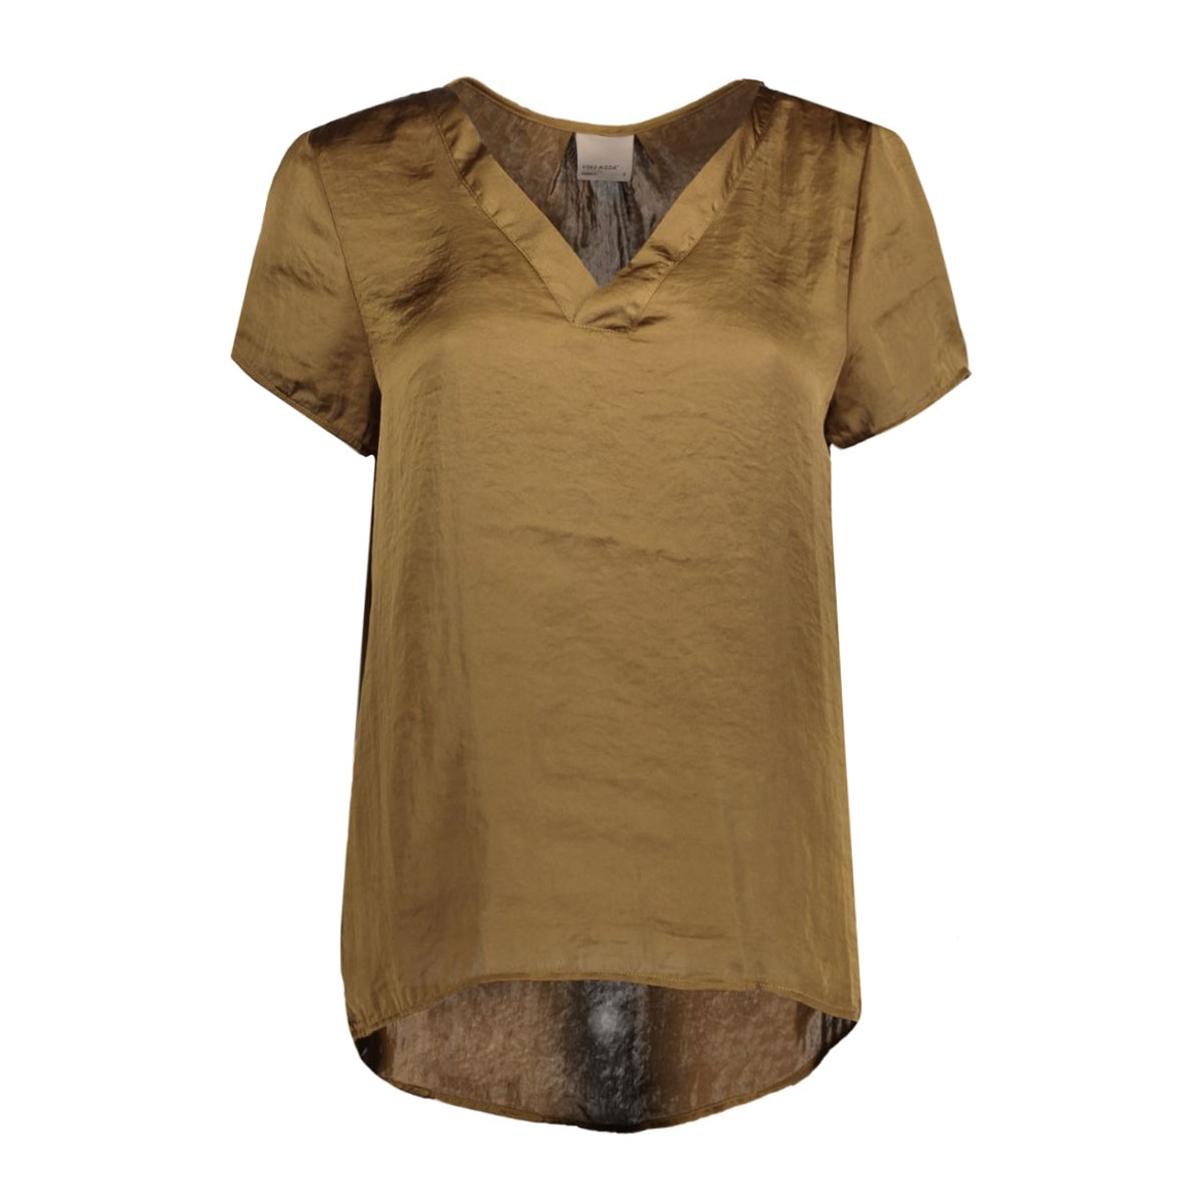 vmhammer cap sleeve midi top a 10165228 vero moda t-shirt kangaroo